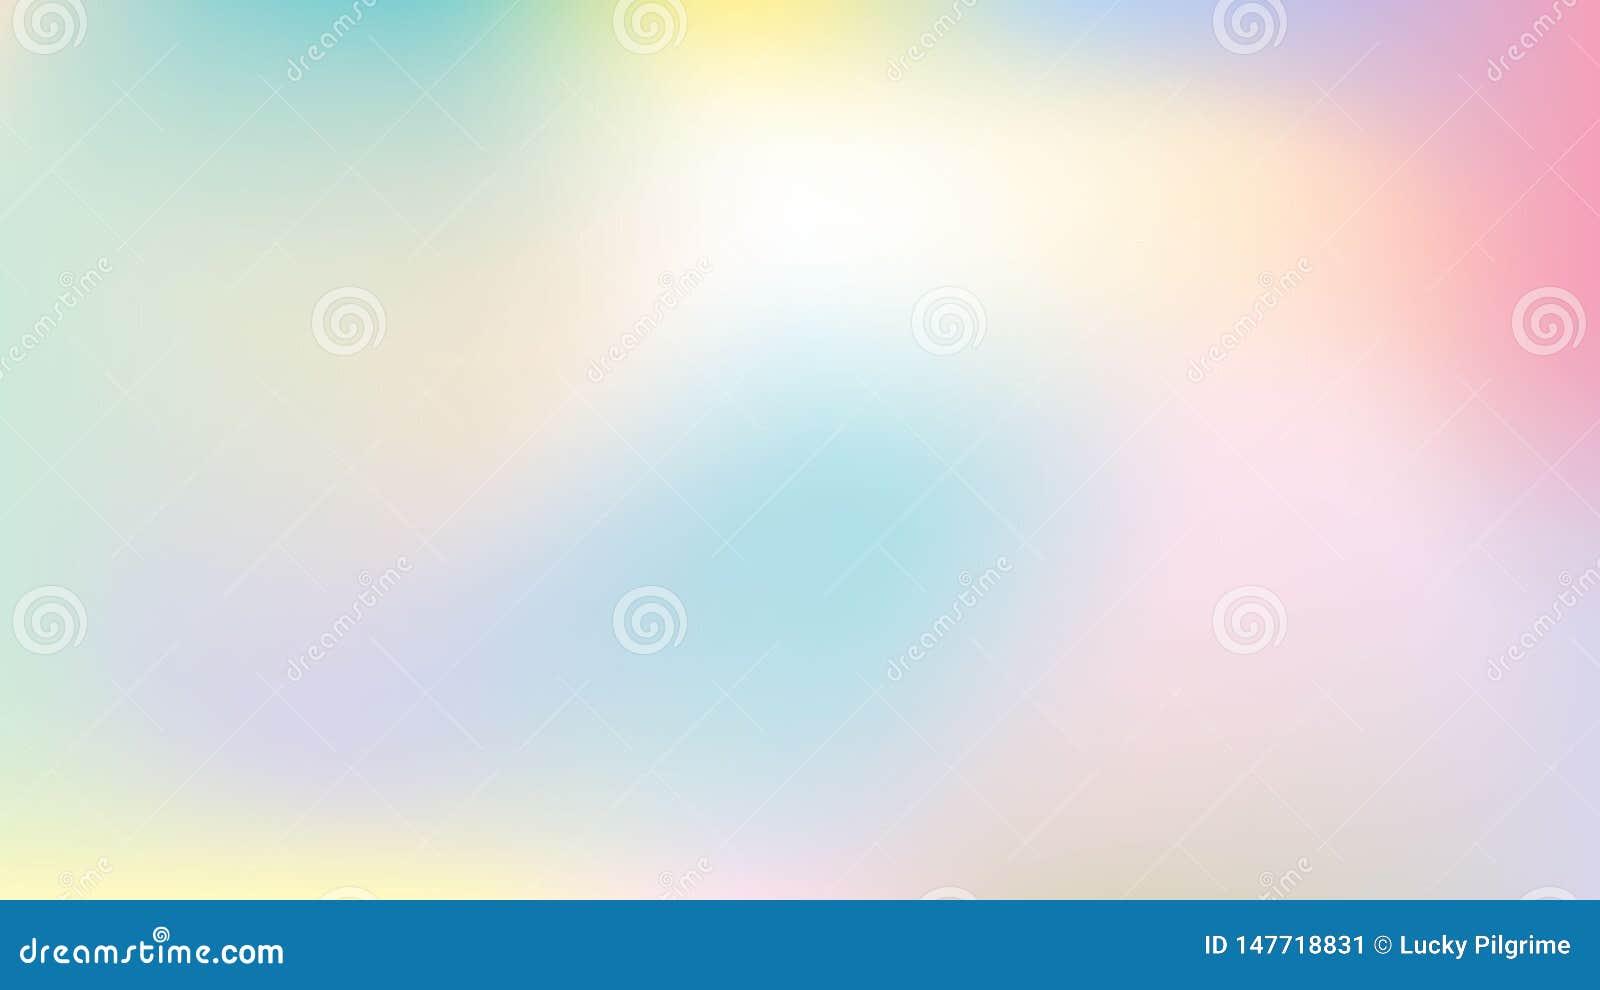 Minimalist pastel background